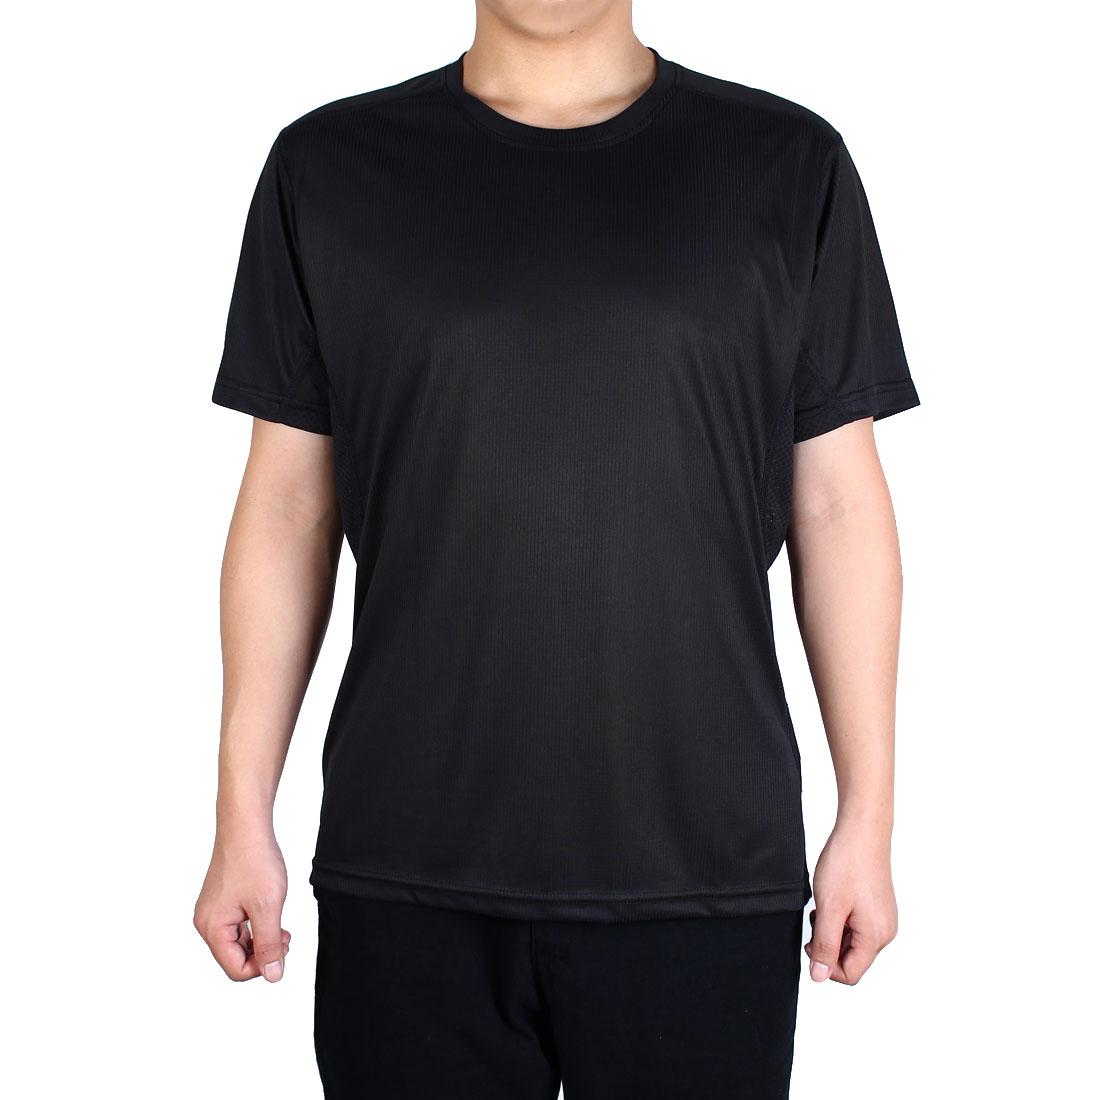 Adult Men Short Sleeve Clothes Casual Wear Tee Running Sports T-shirt Black L